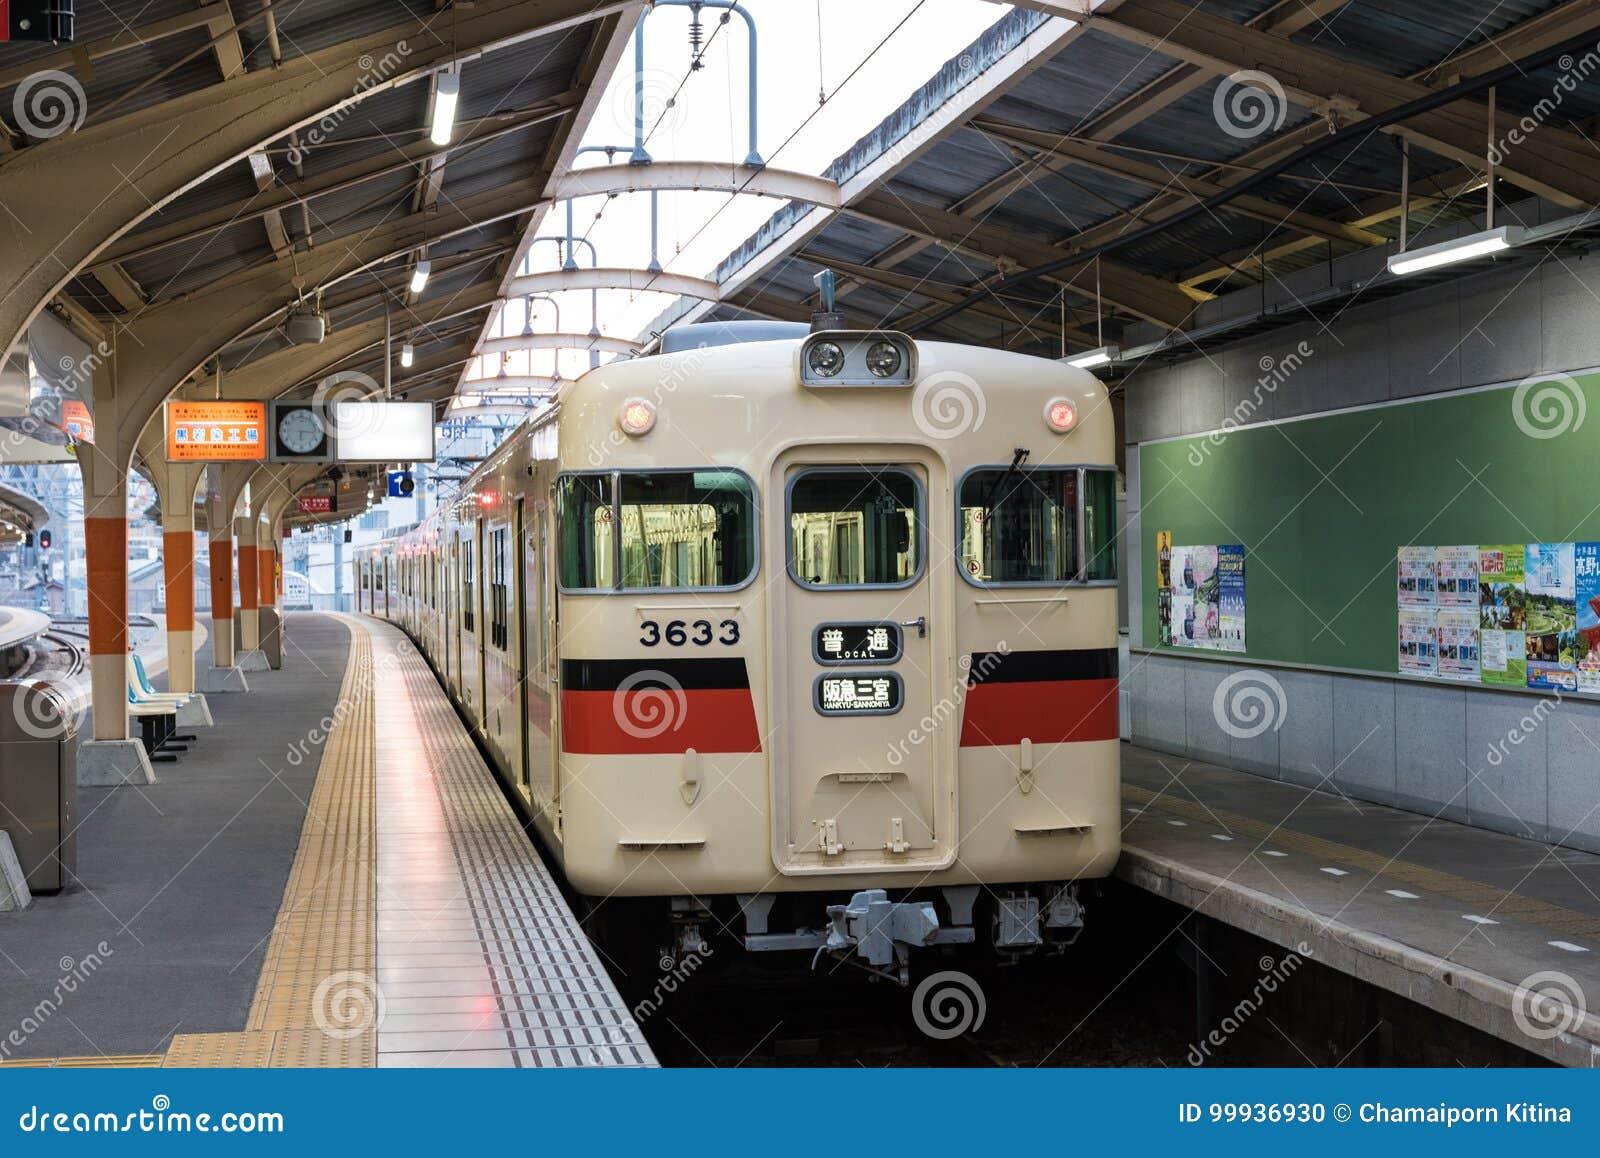 Hankyu-Sannomiya Line Of Local Train Editorial Image - Image